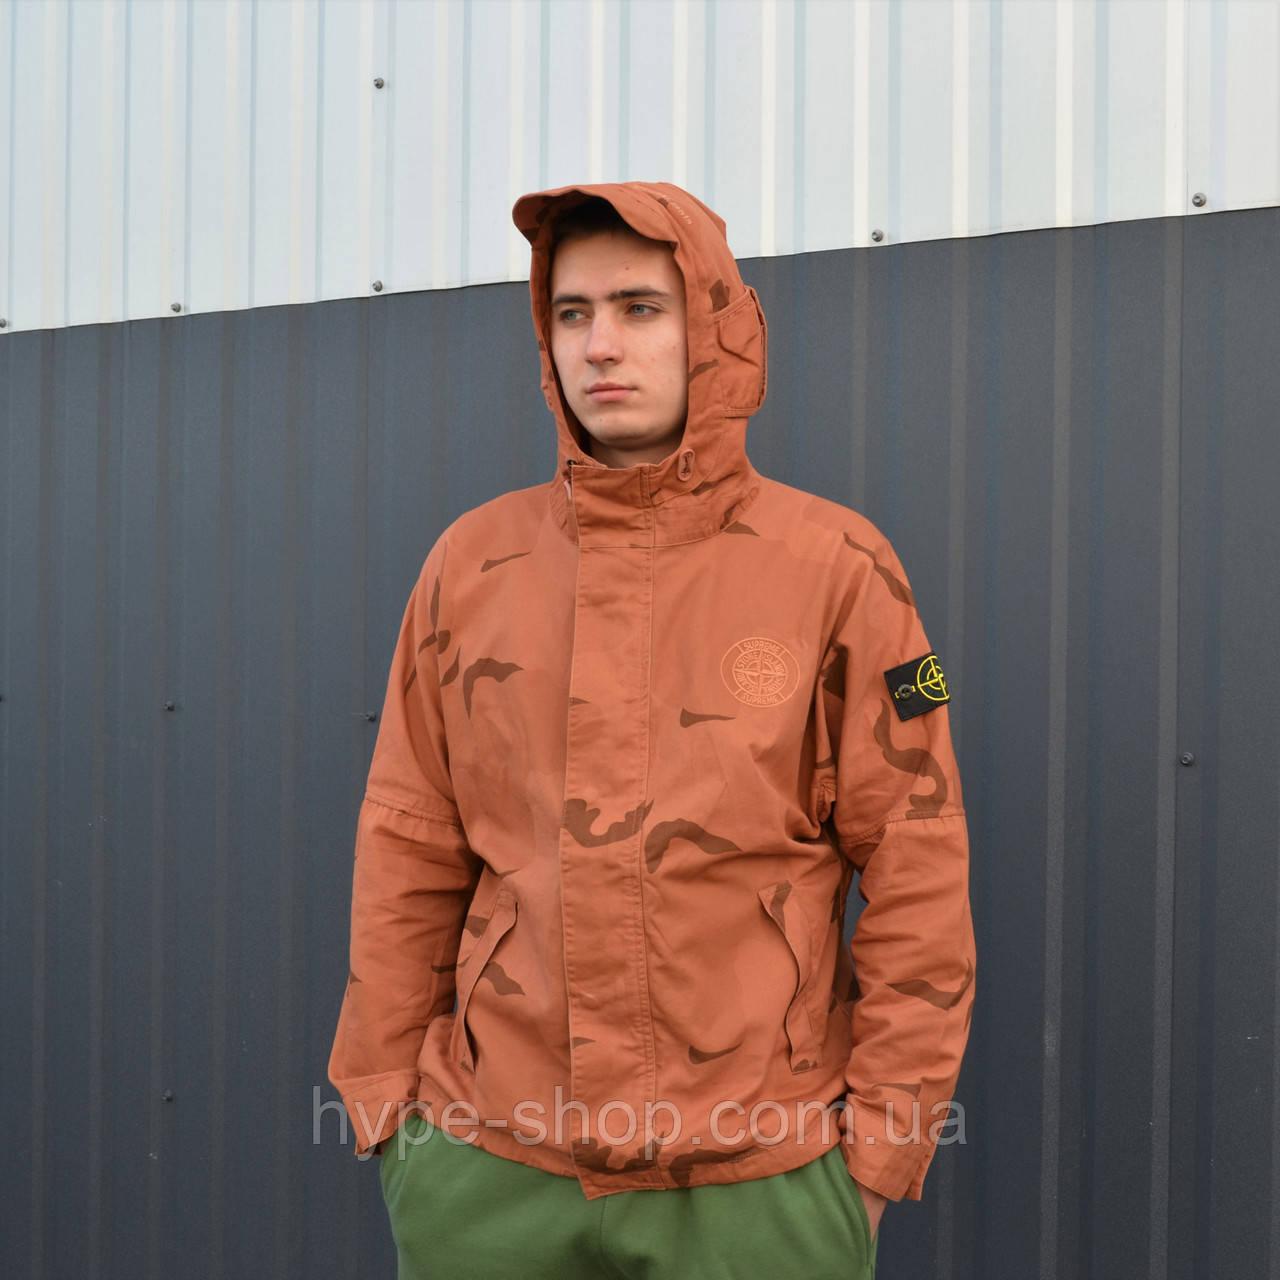 Куртка в стиле Stone Island x Supreme |  Топовое качество!!